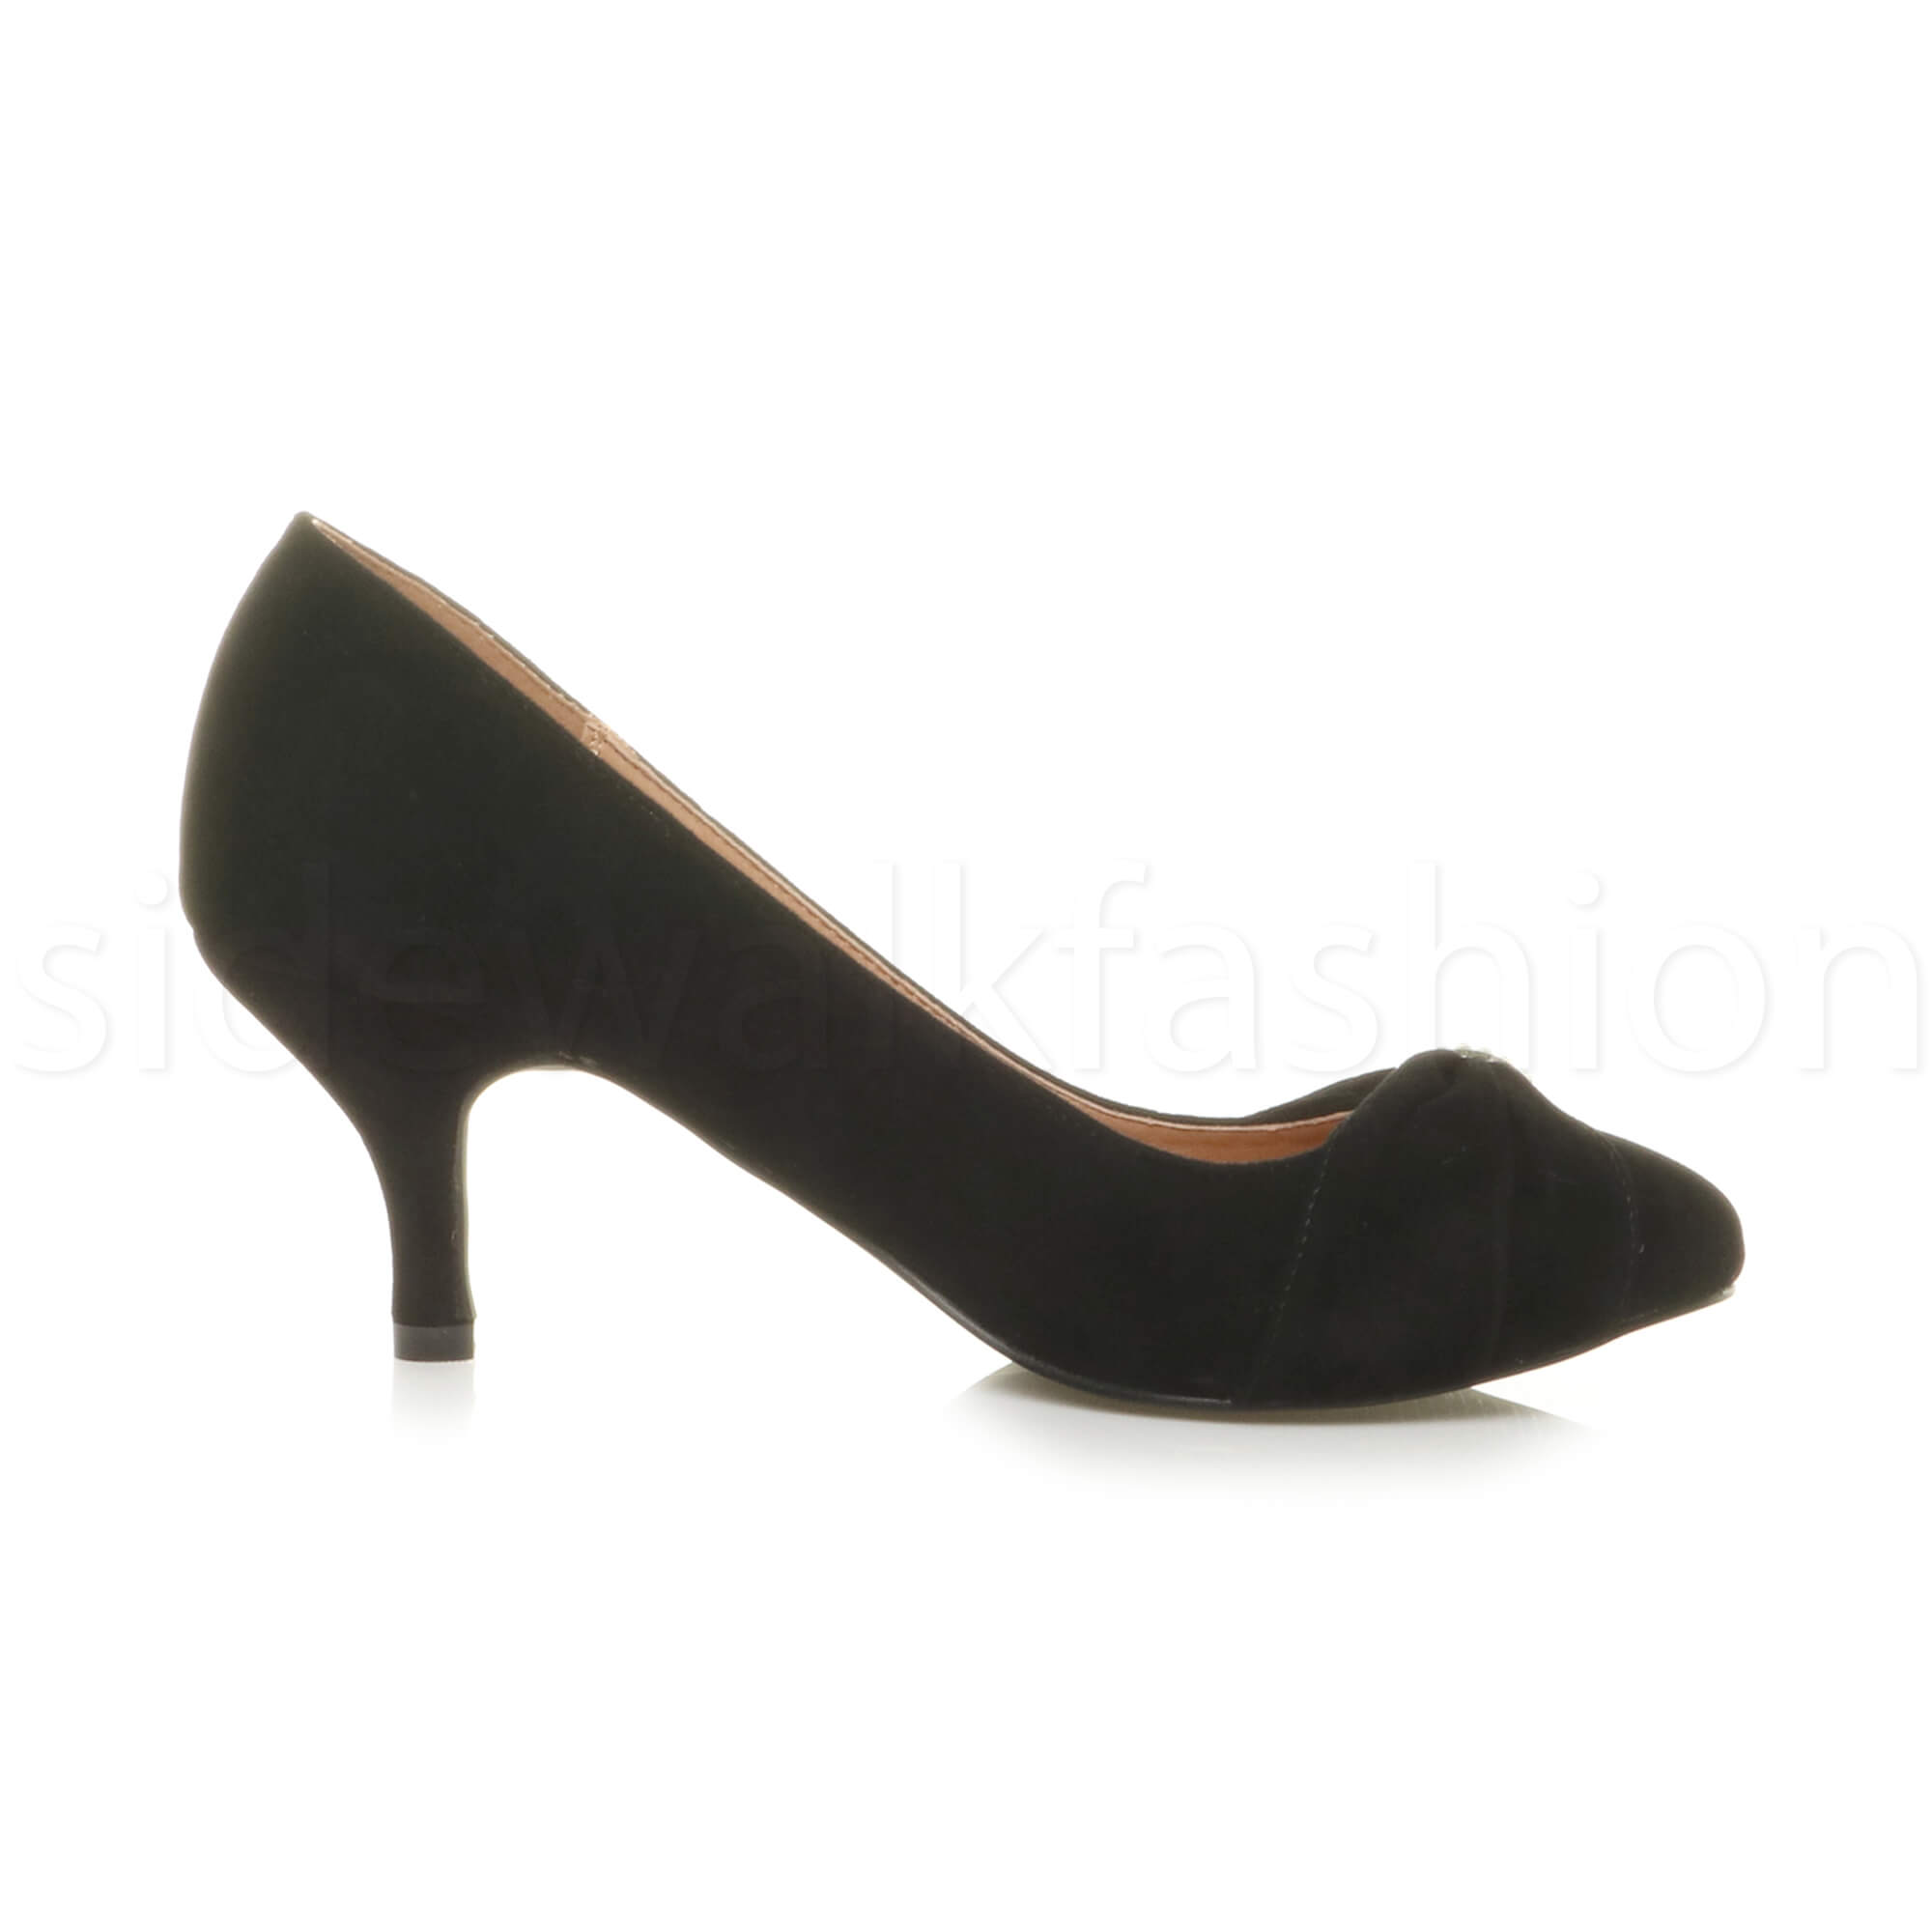 Womens-ladies-low-mid-heel-diamante-party-smart-evening-court-shoes-size thumbnail 20